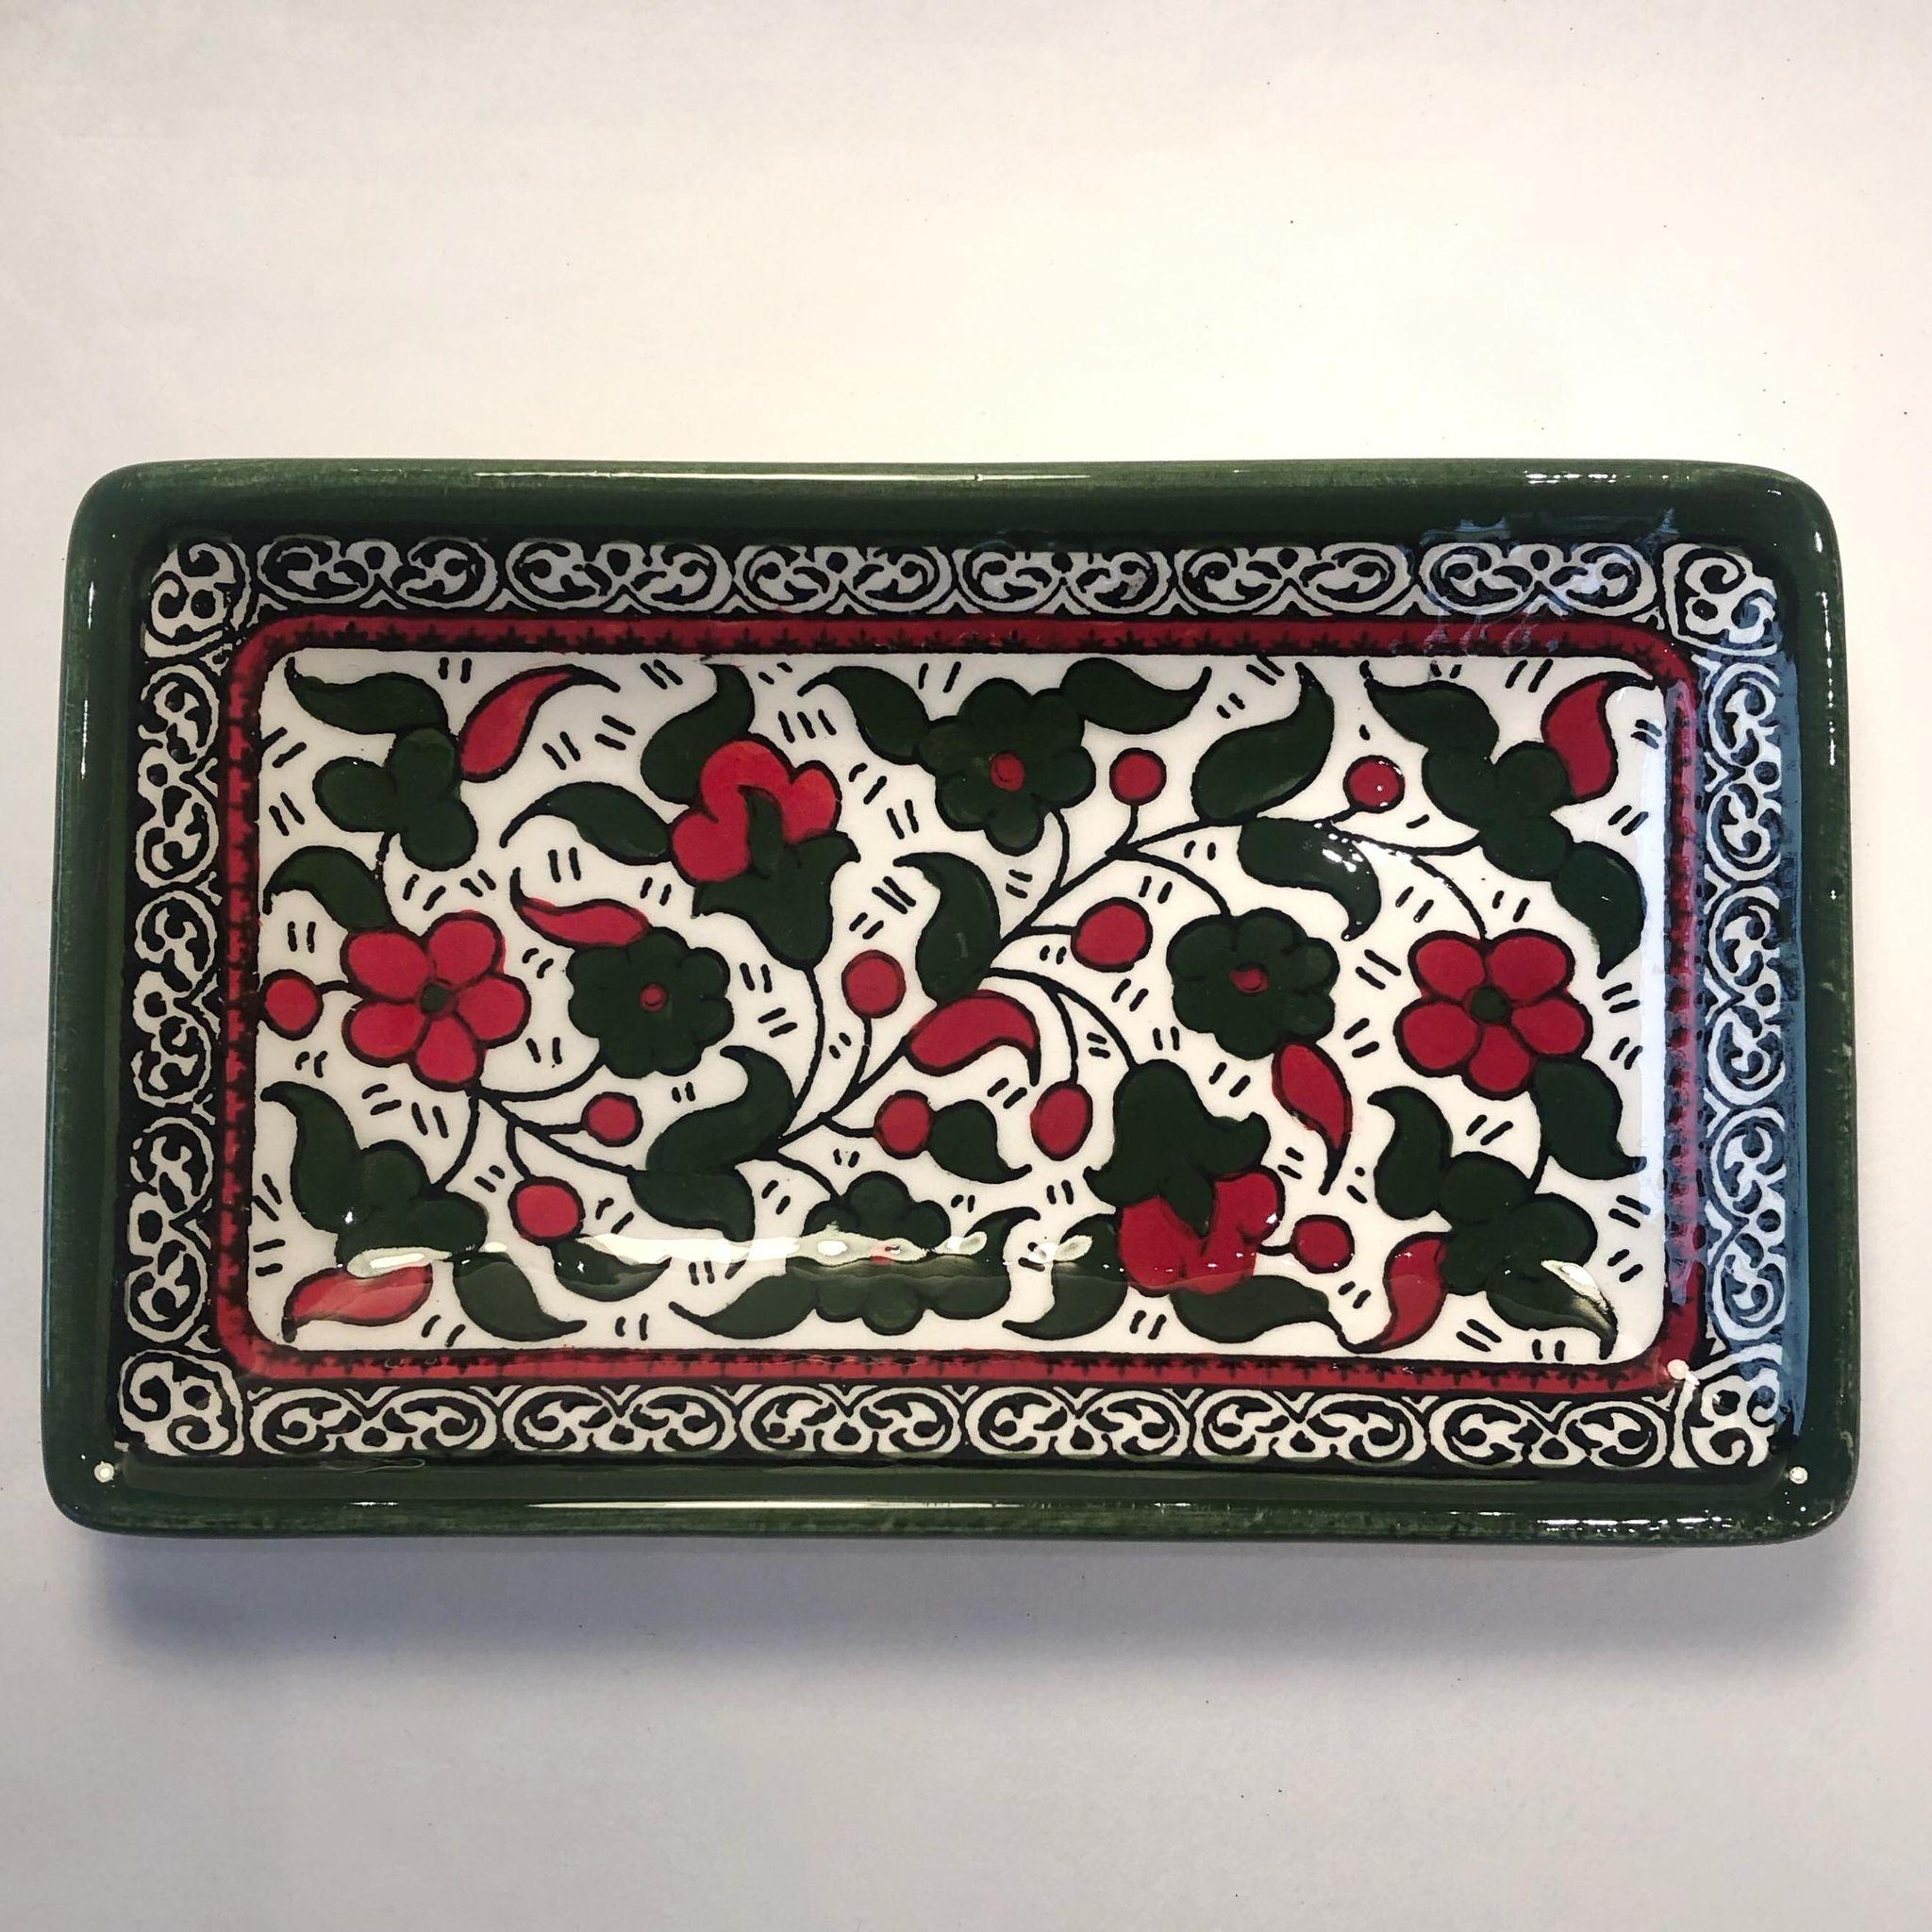 Firkantet keramikkskål, grønn og rød